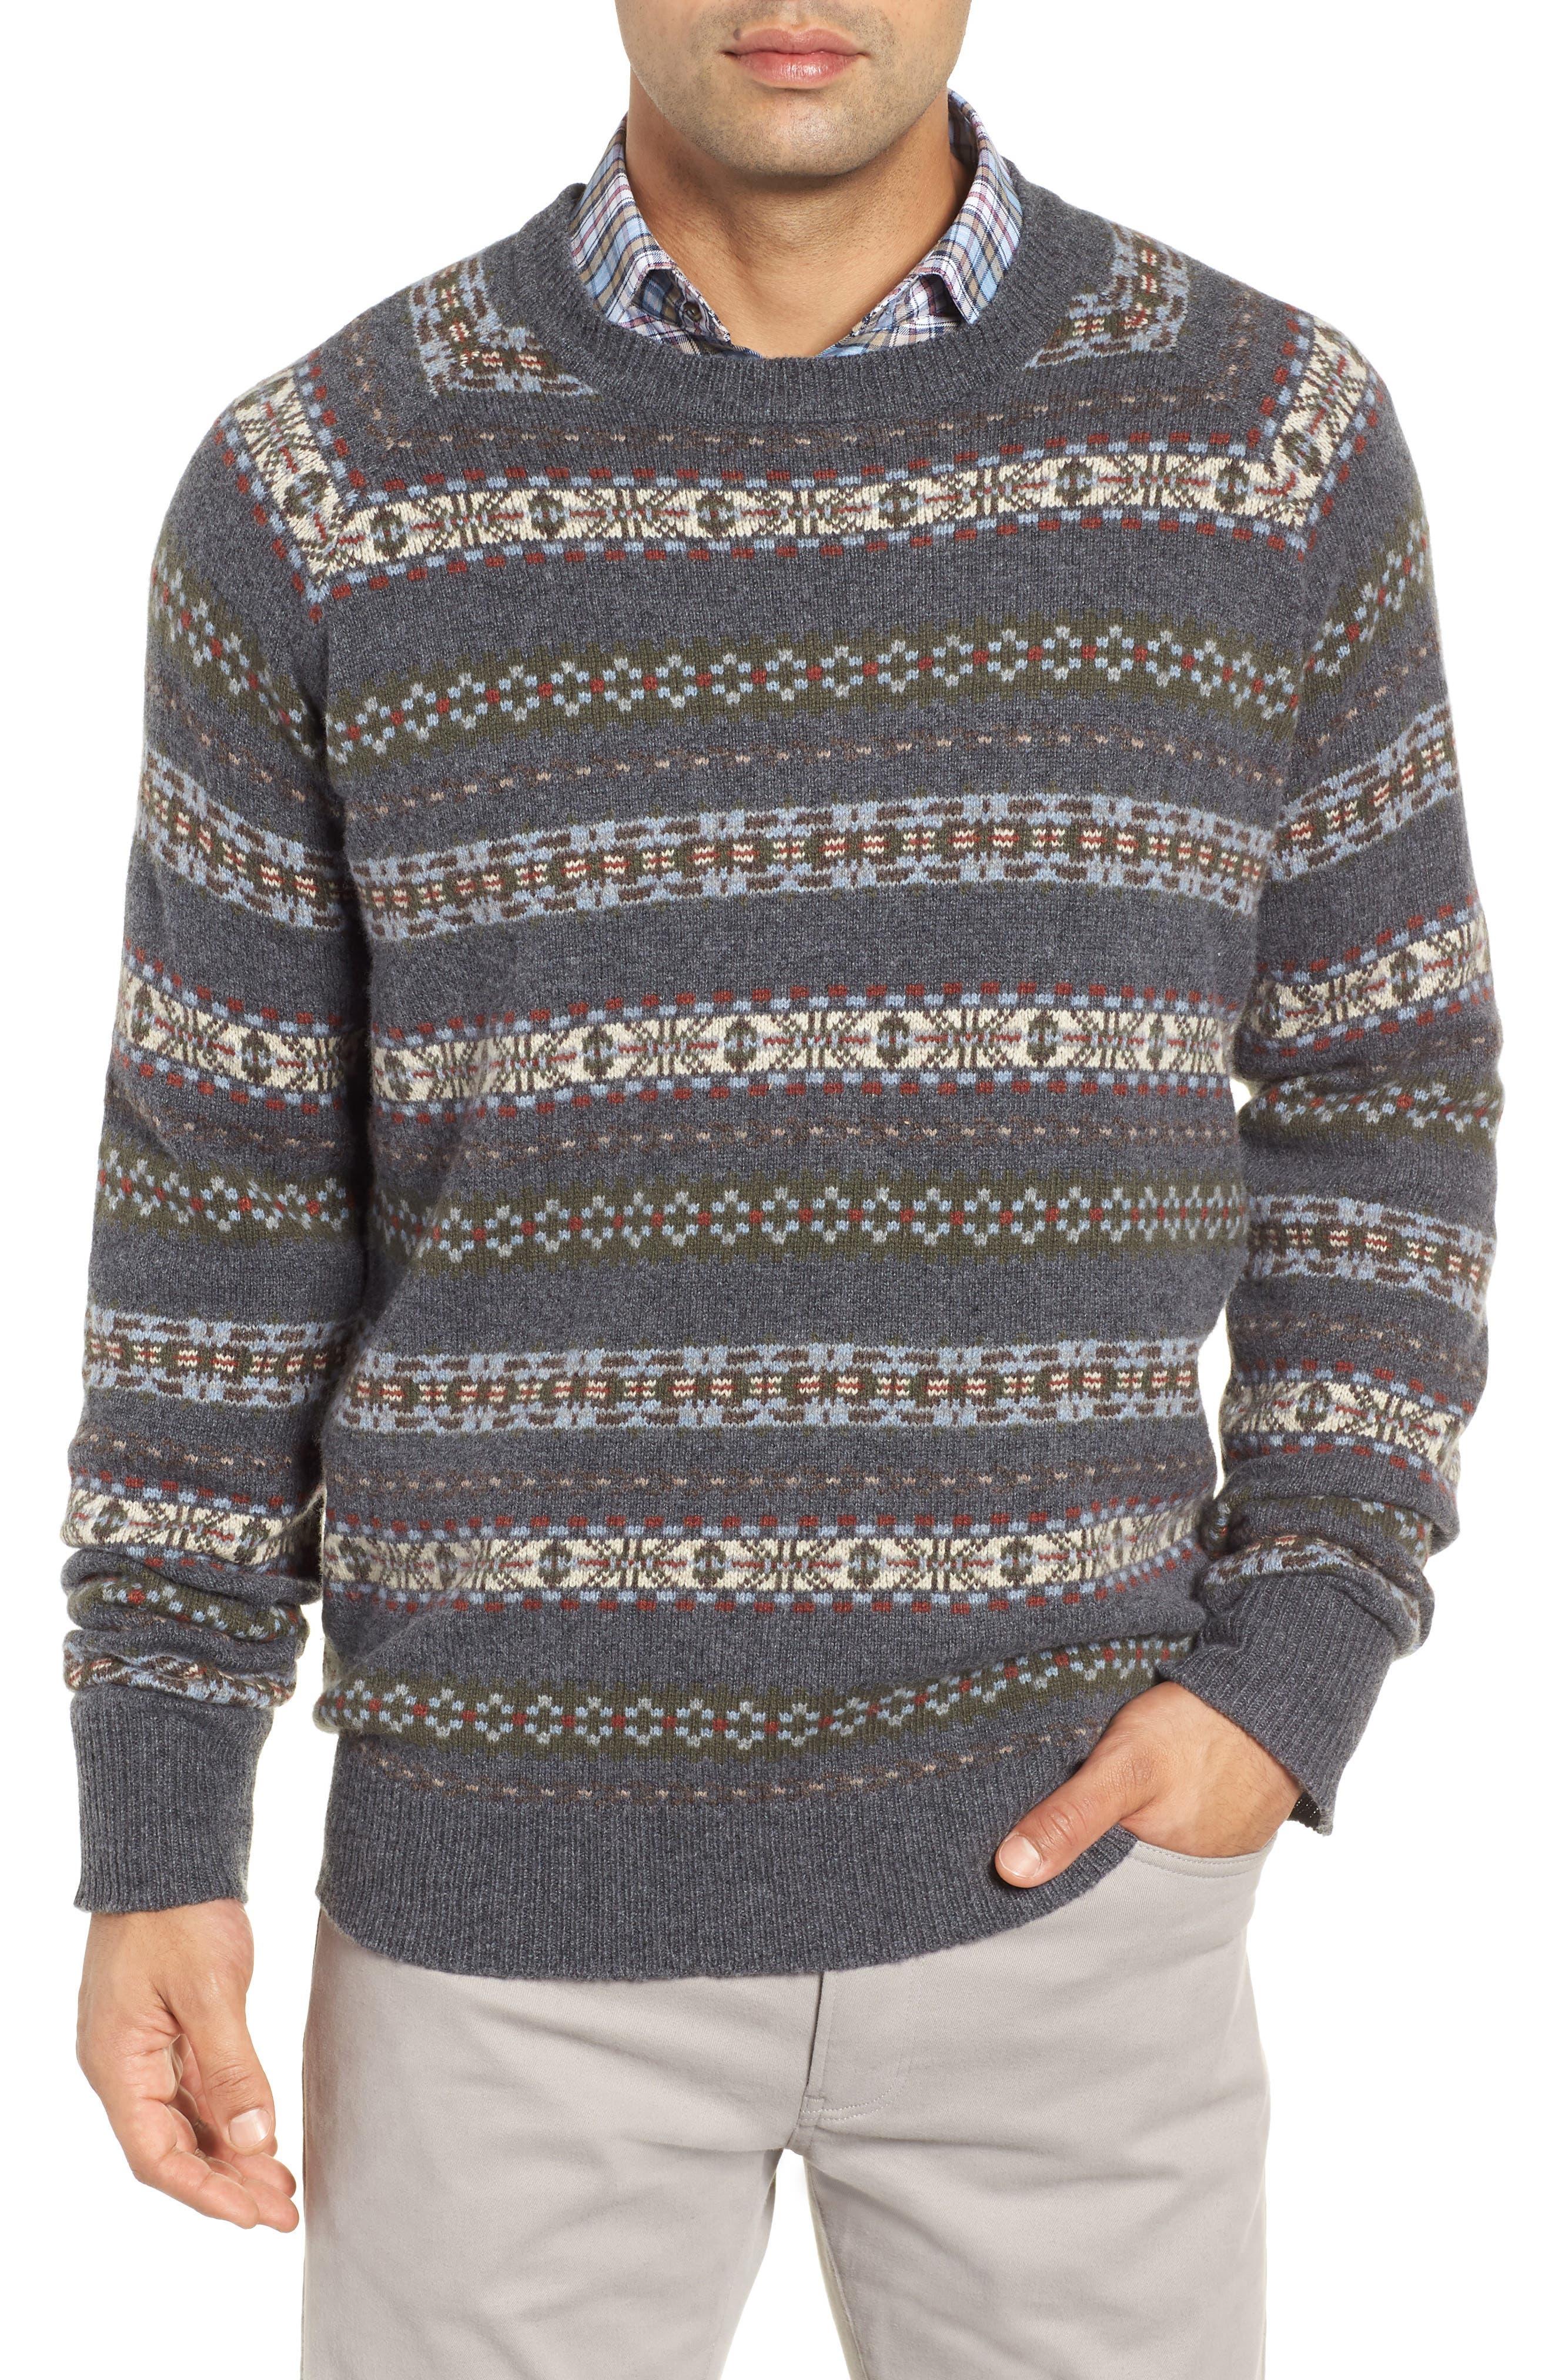 PETER MILLAR Mountainside Fair Isle Crewneck Sweater, Main, color, BLACK